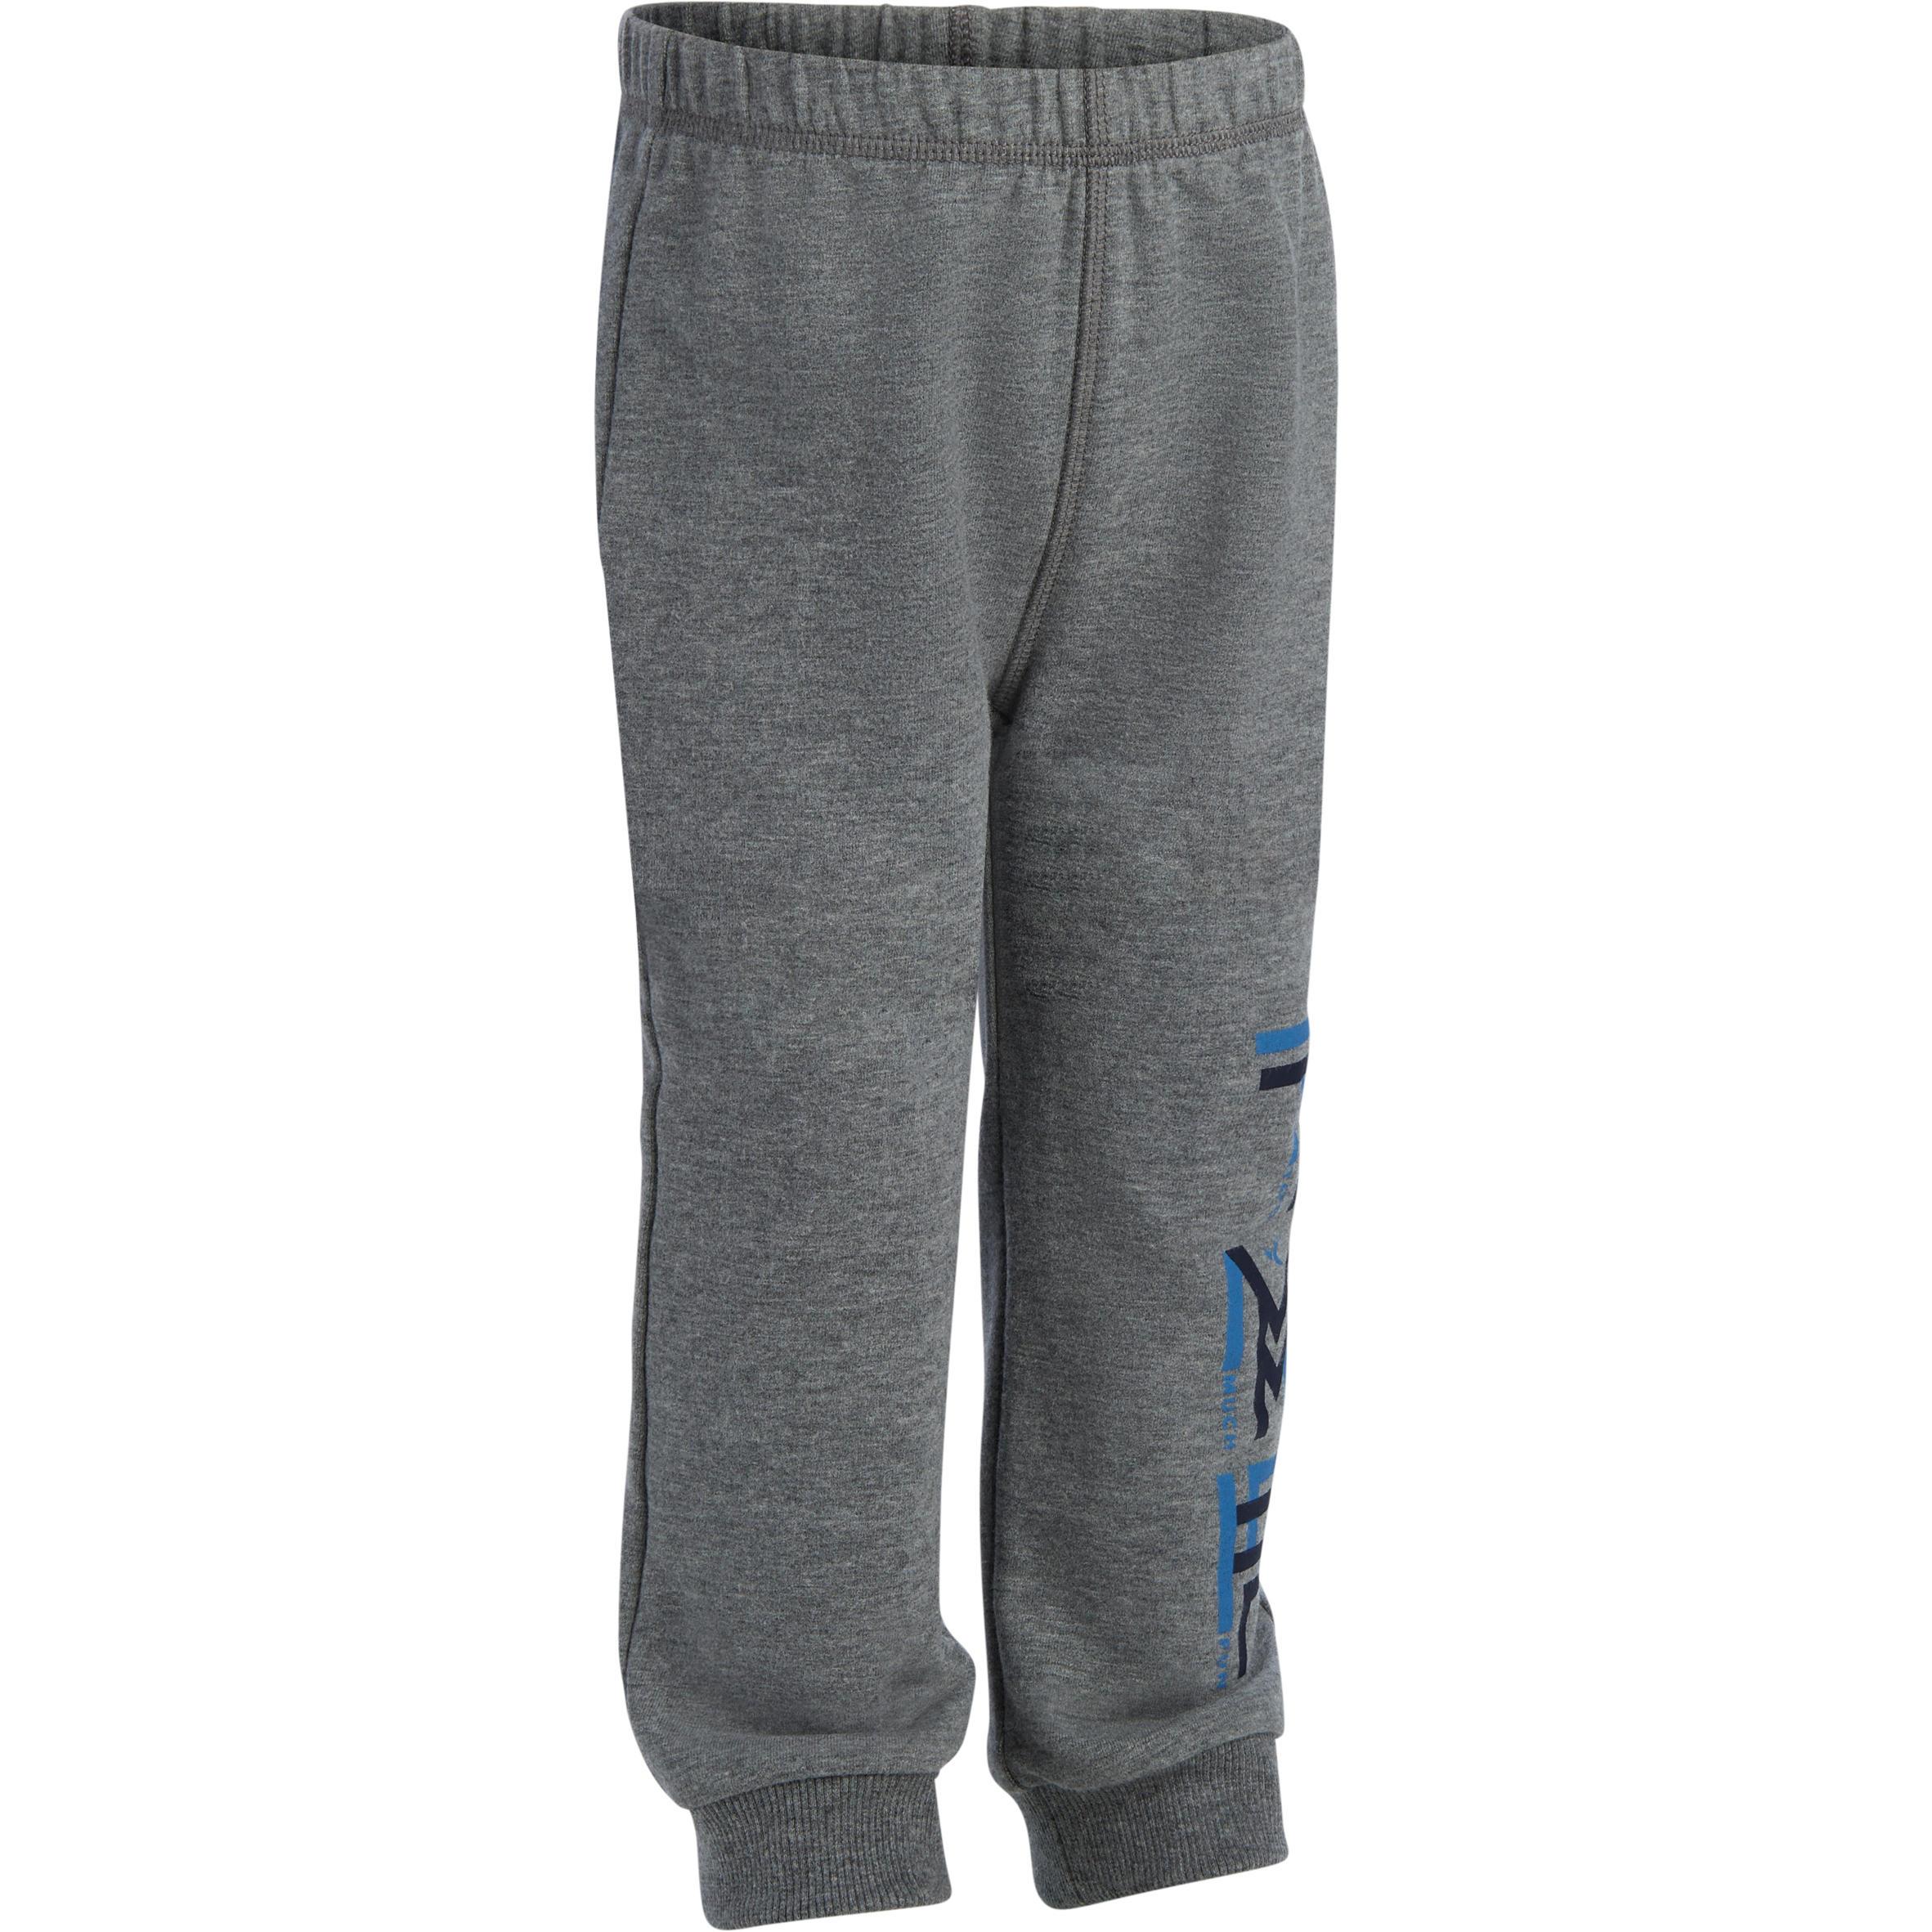 Pants 520 cálido gimnasia infantil estampado gris